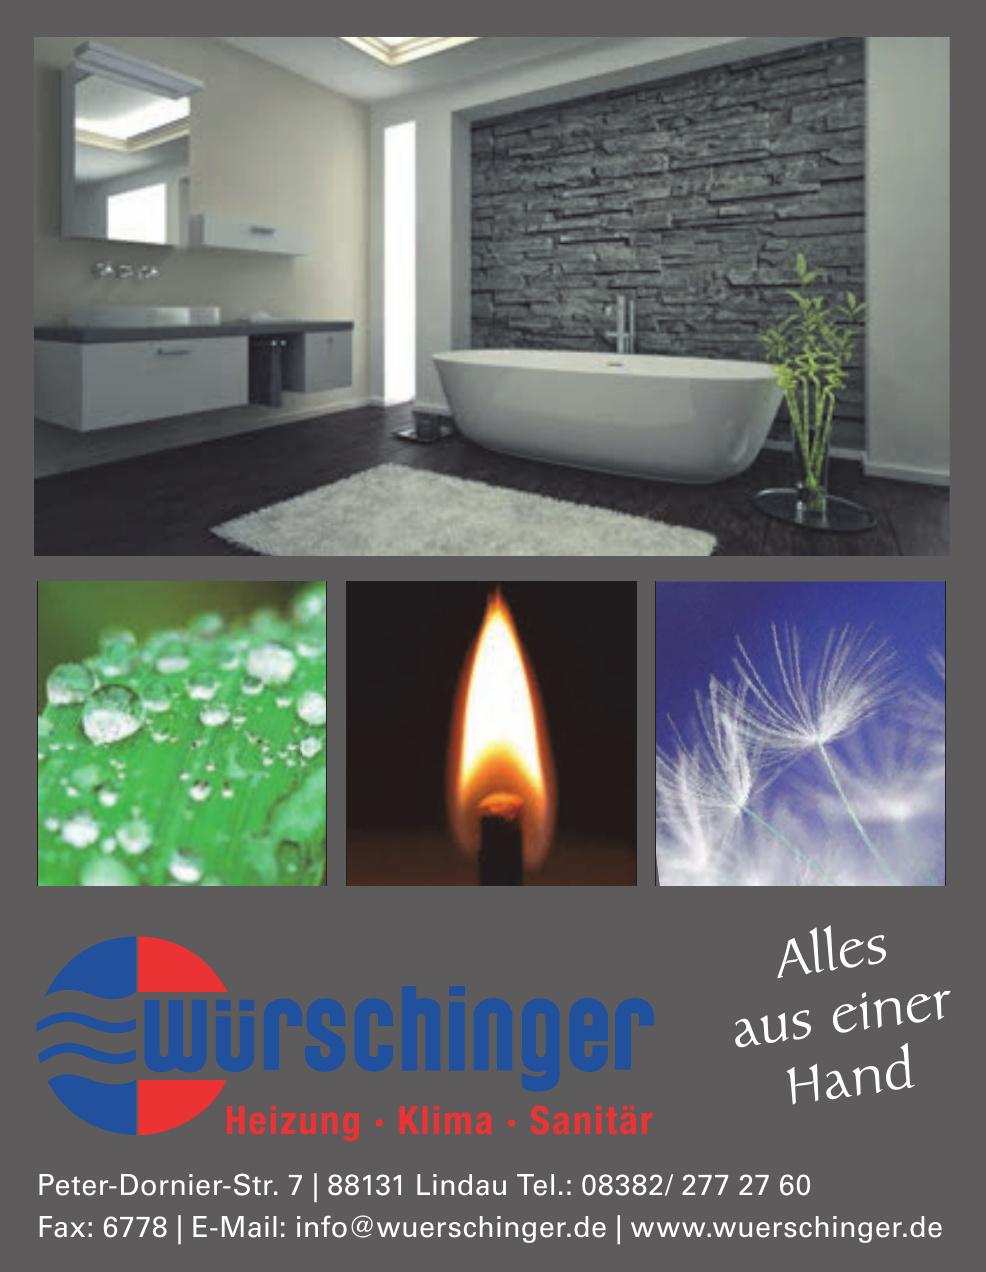 Würschinger GmbH